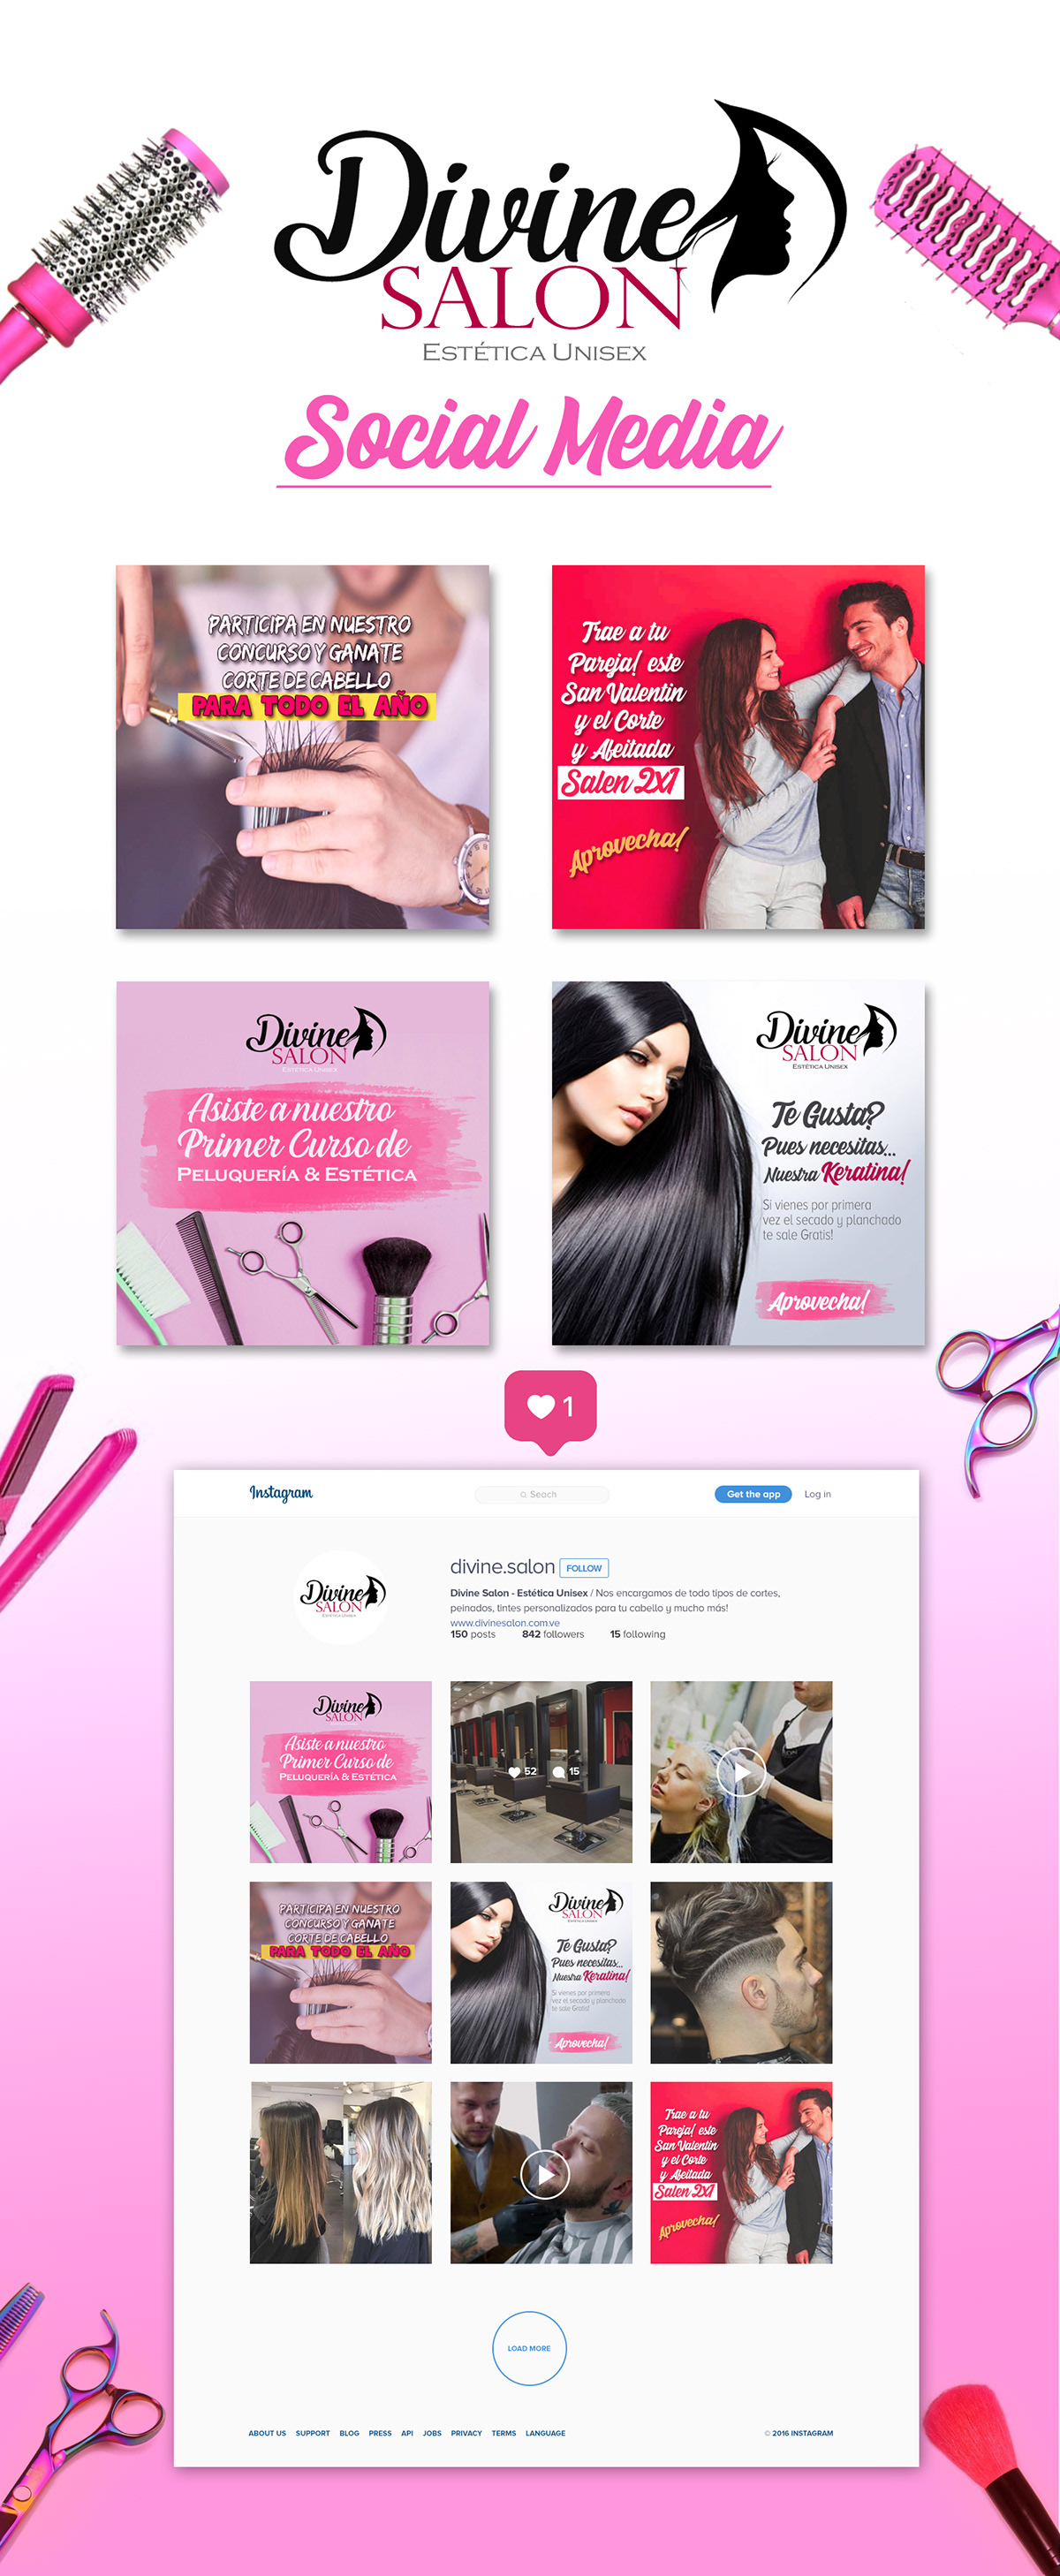 Divine Salon Social Media On Pantone Canvas Gallery